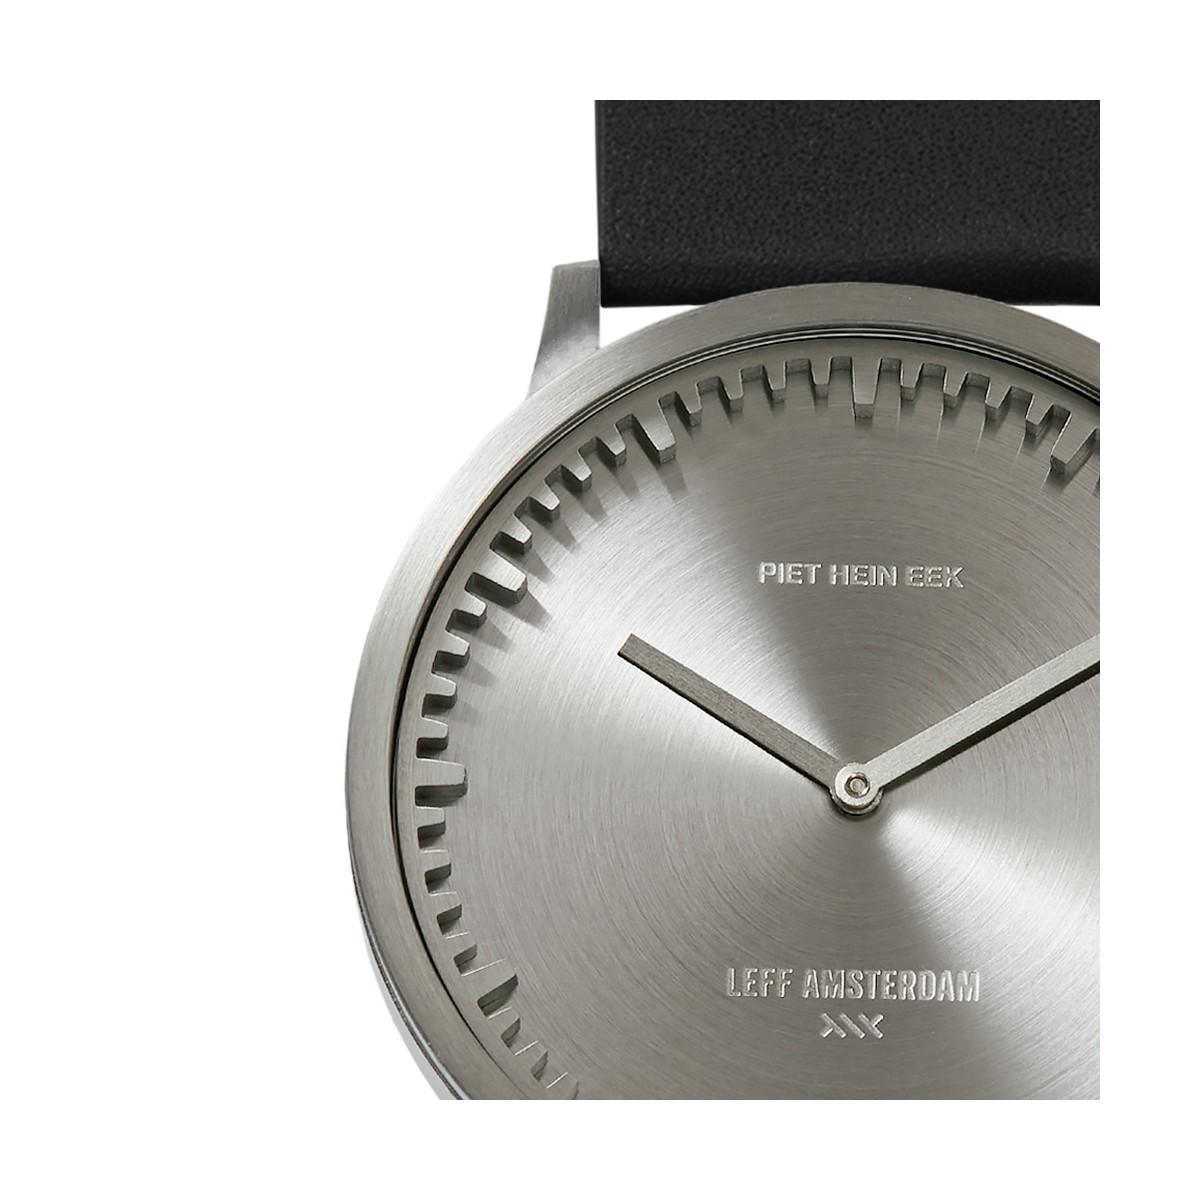 8f8b80a14 Leff Amsterdam Tube Watch T40 Steel / Leather - Mukama